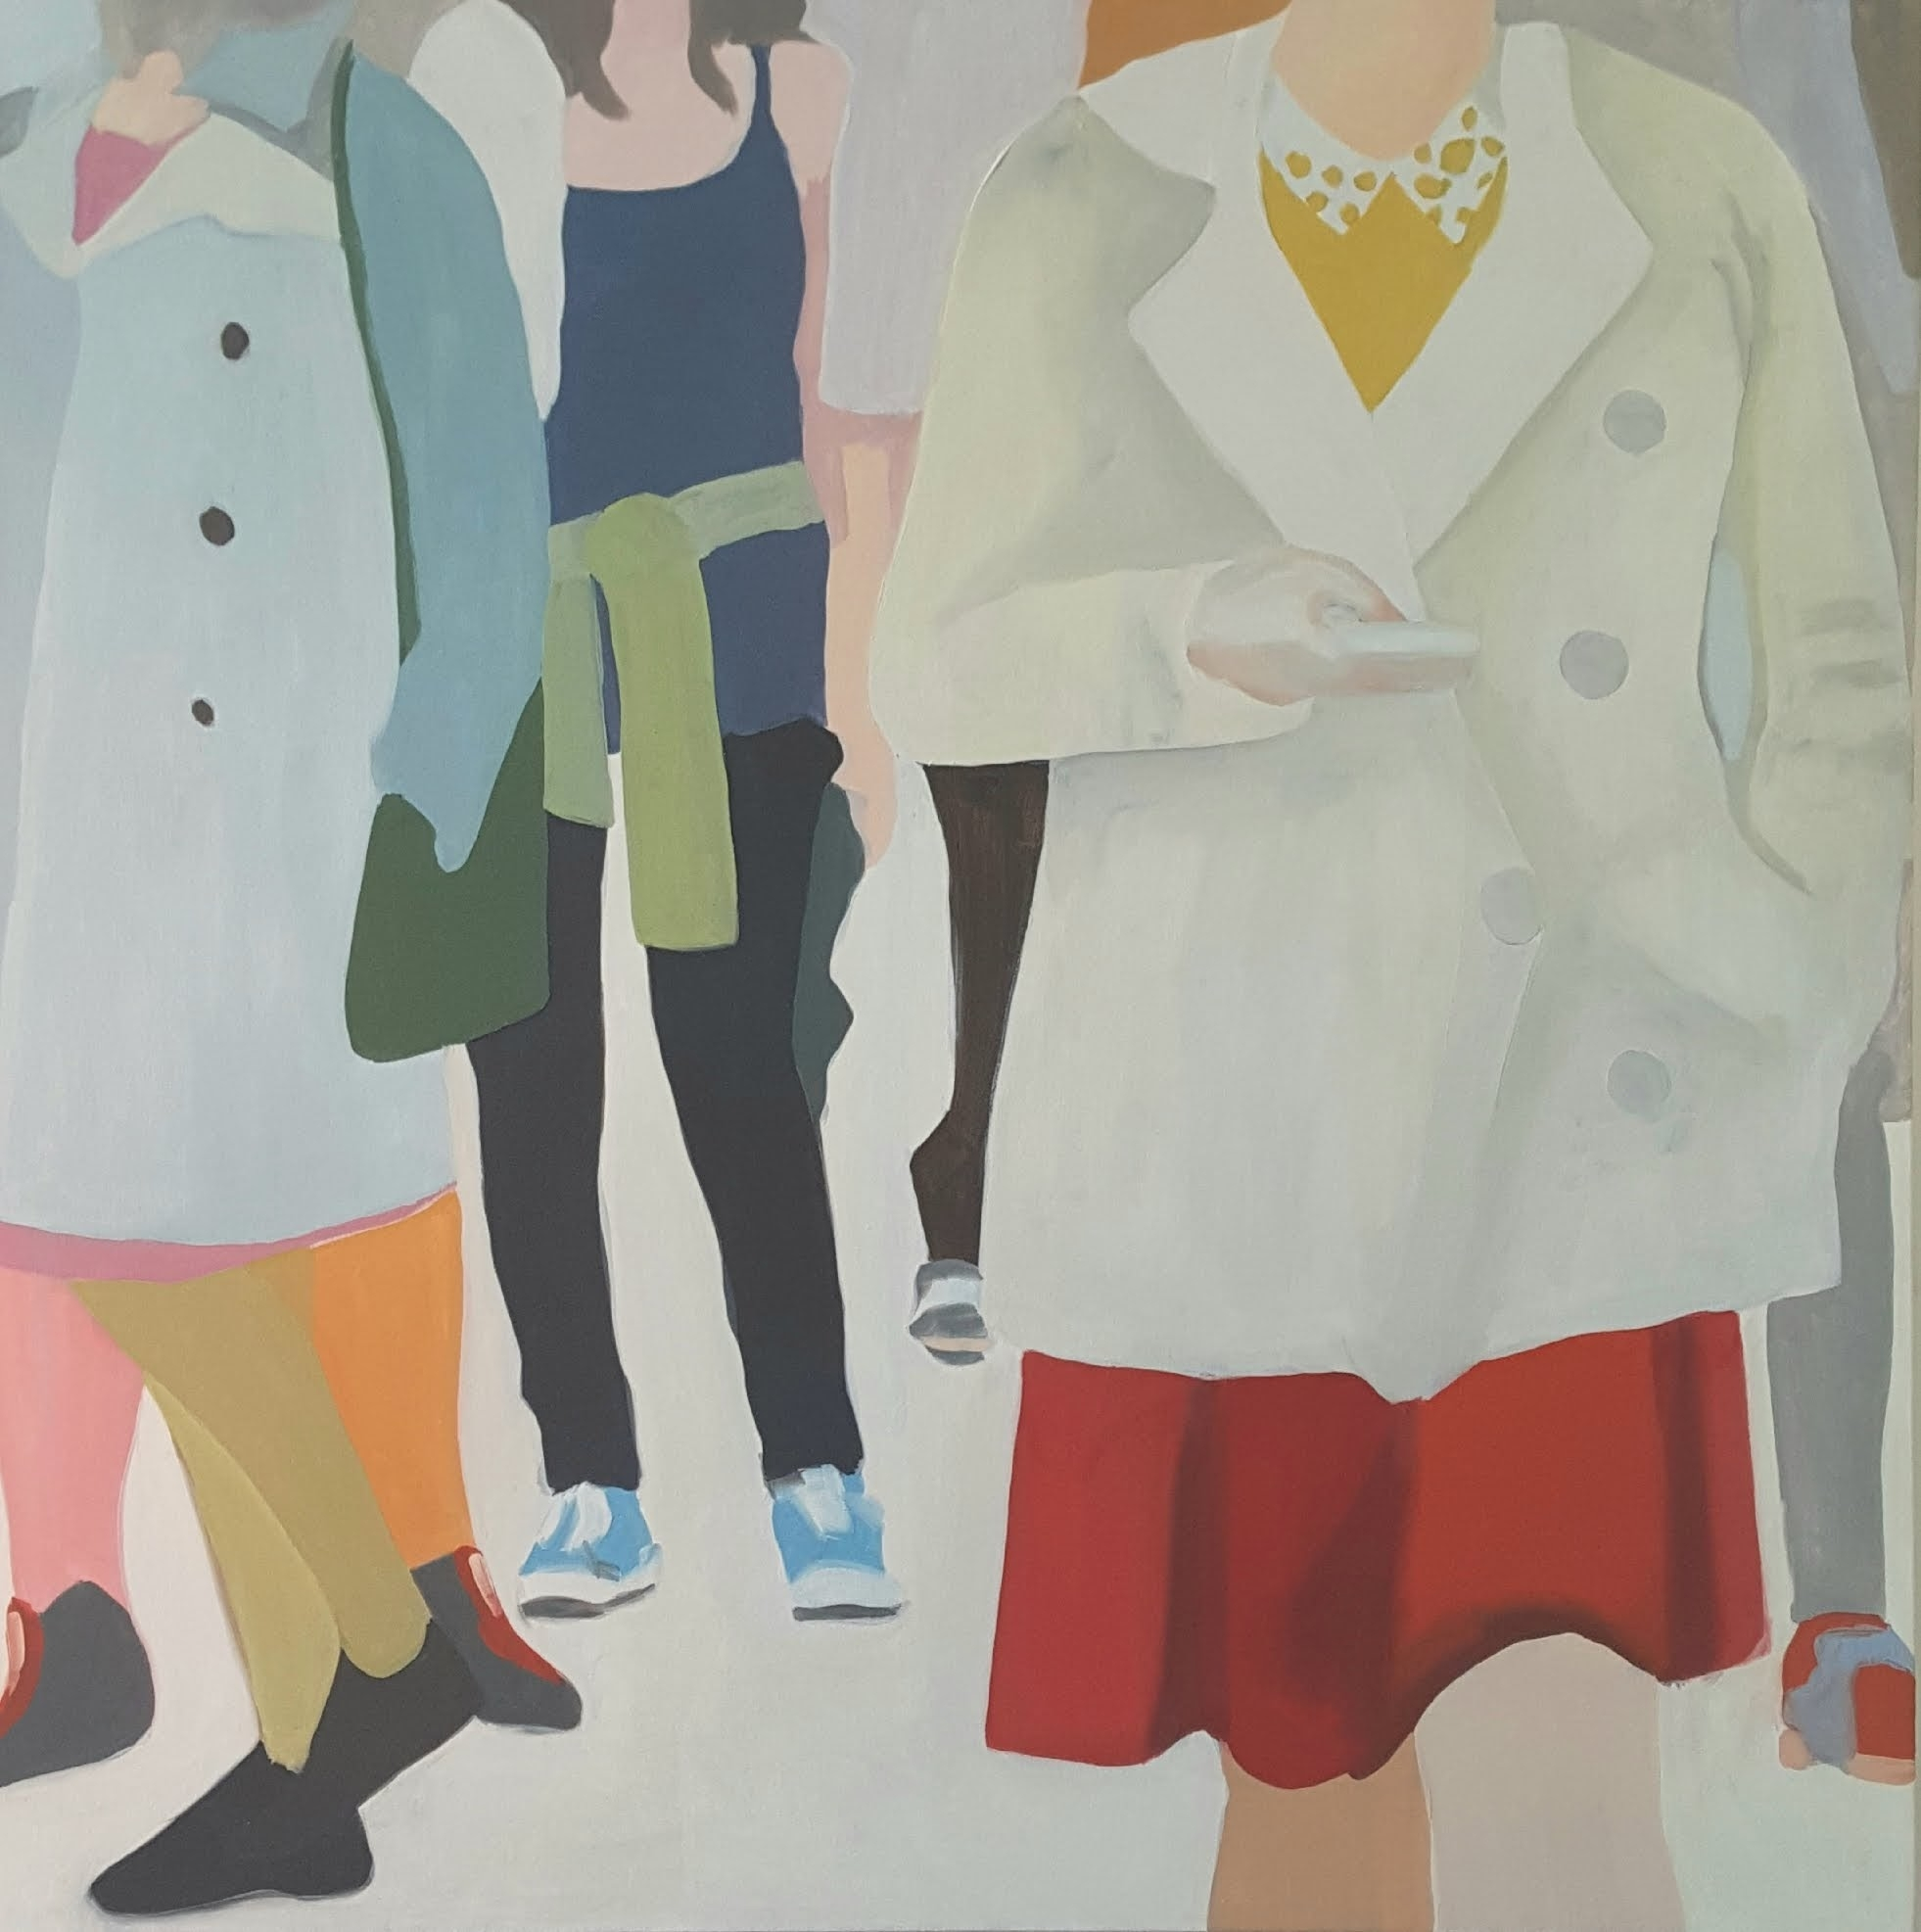 Bystanders #5  by Sherry  Czekus